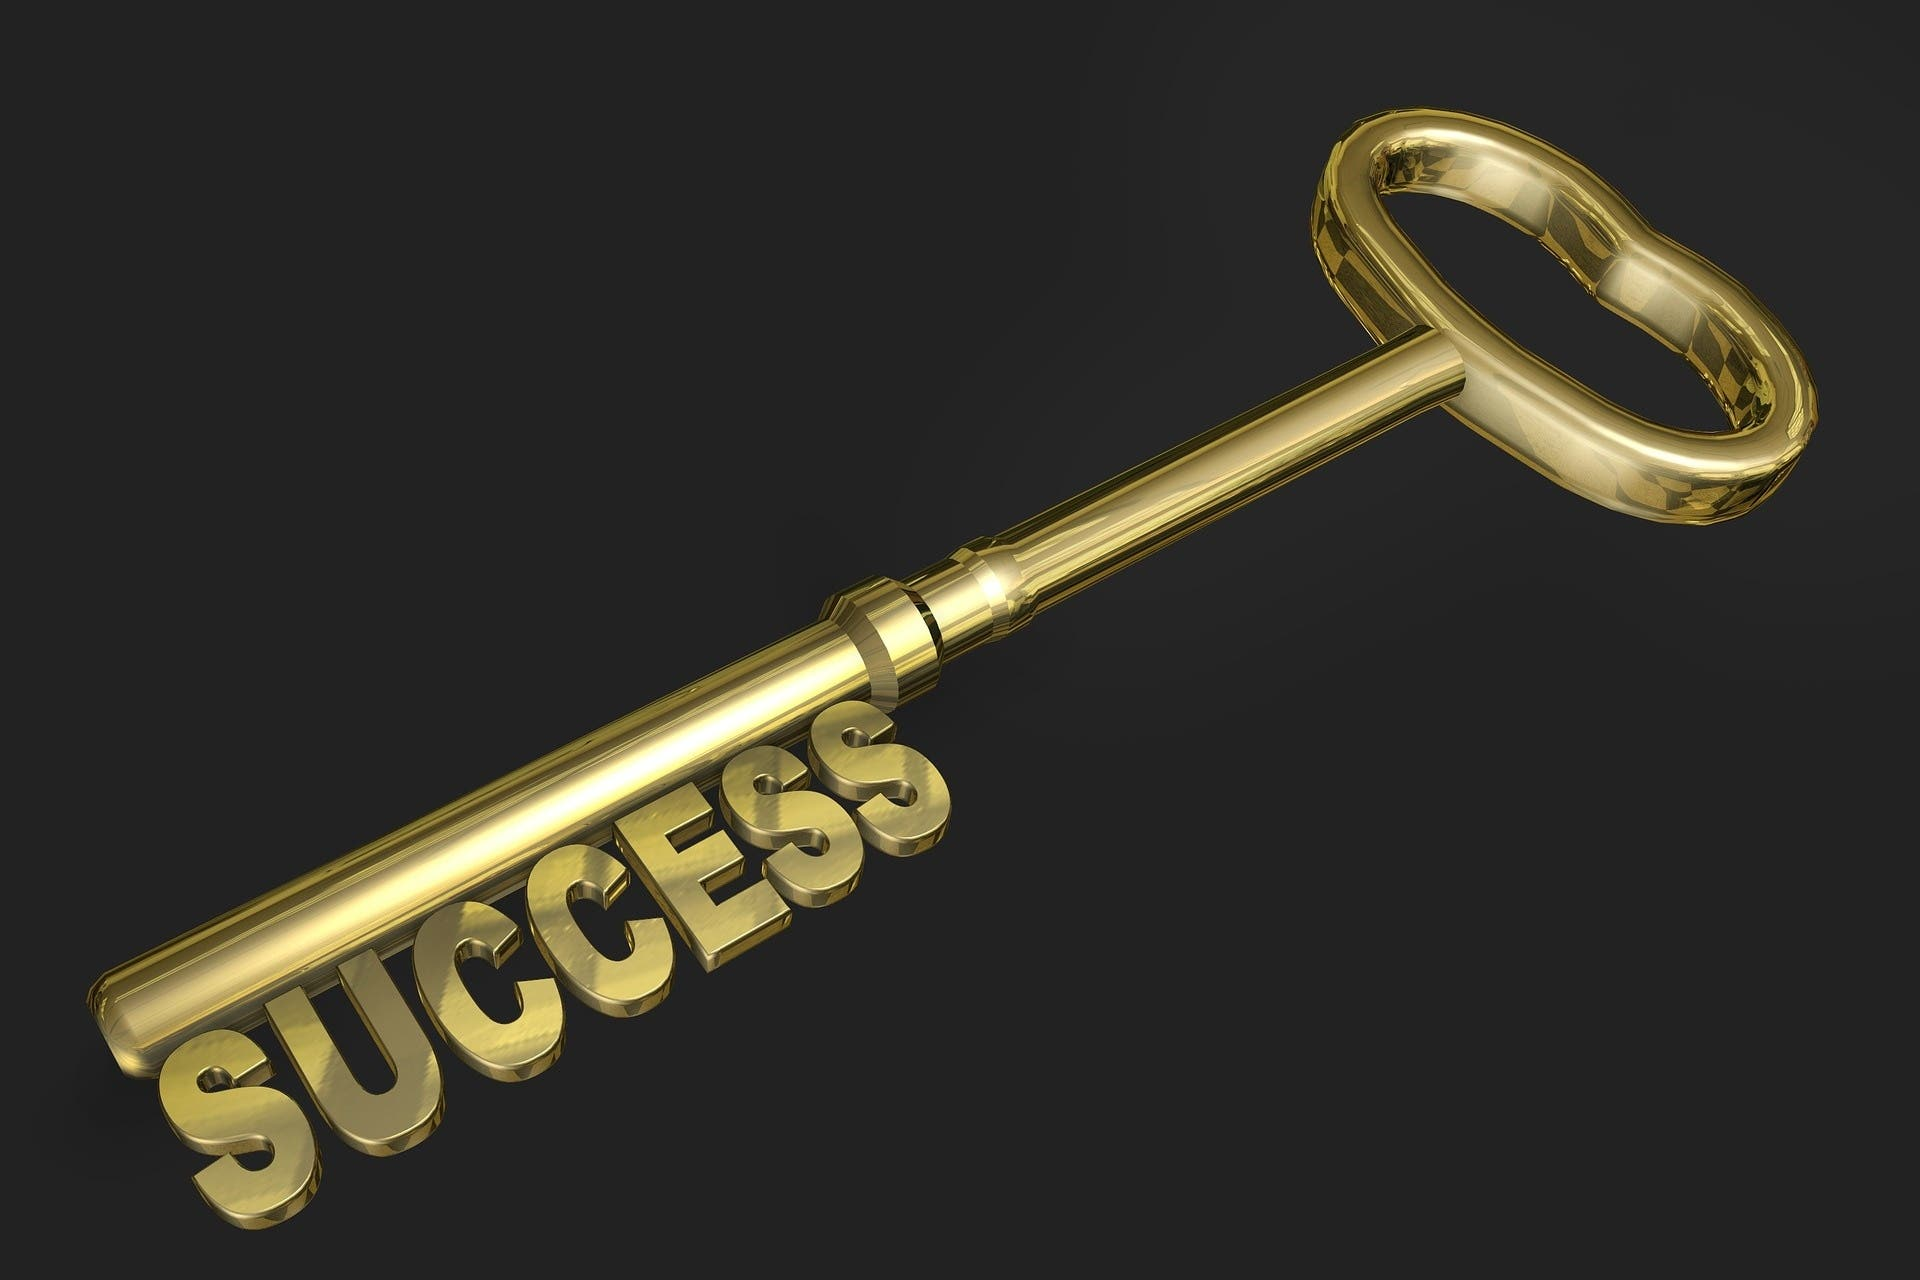 THE SUCCESS FOUNDATION - 6 PILLAR SUCCESS SYSTEM